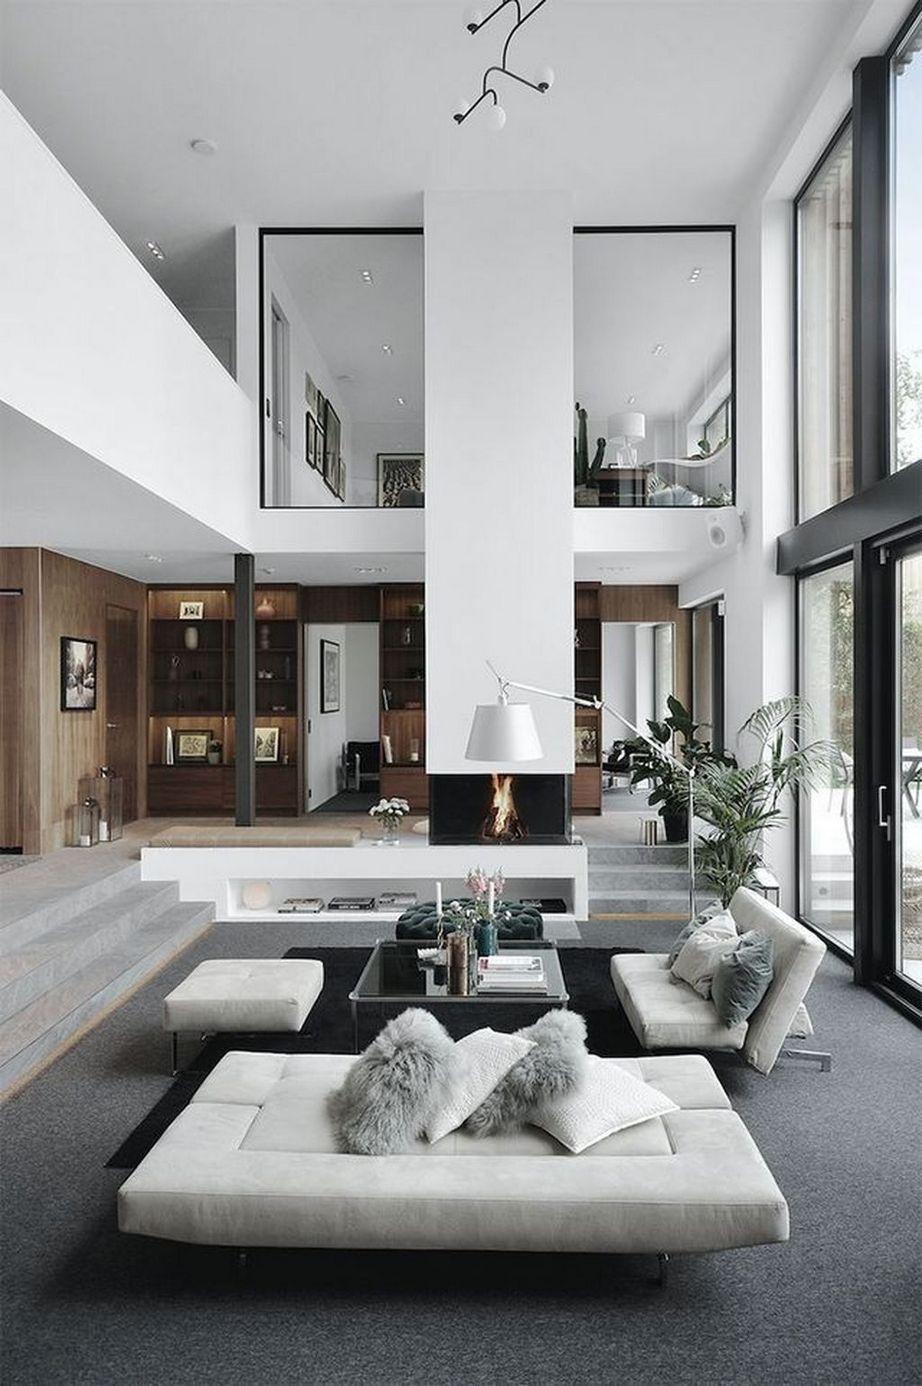 30 Cute Succulent Decoration Ideas For Living Room Trenduhome Small Living Room Decor Living Room Decor Living Room Decor Modern